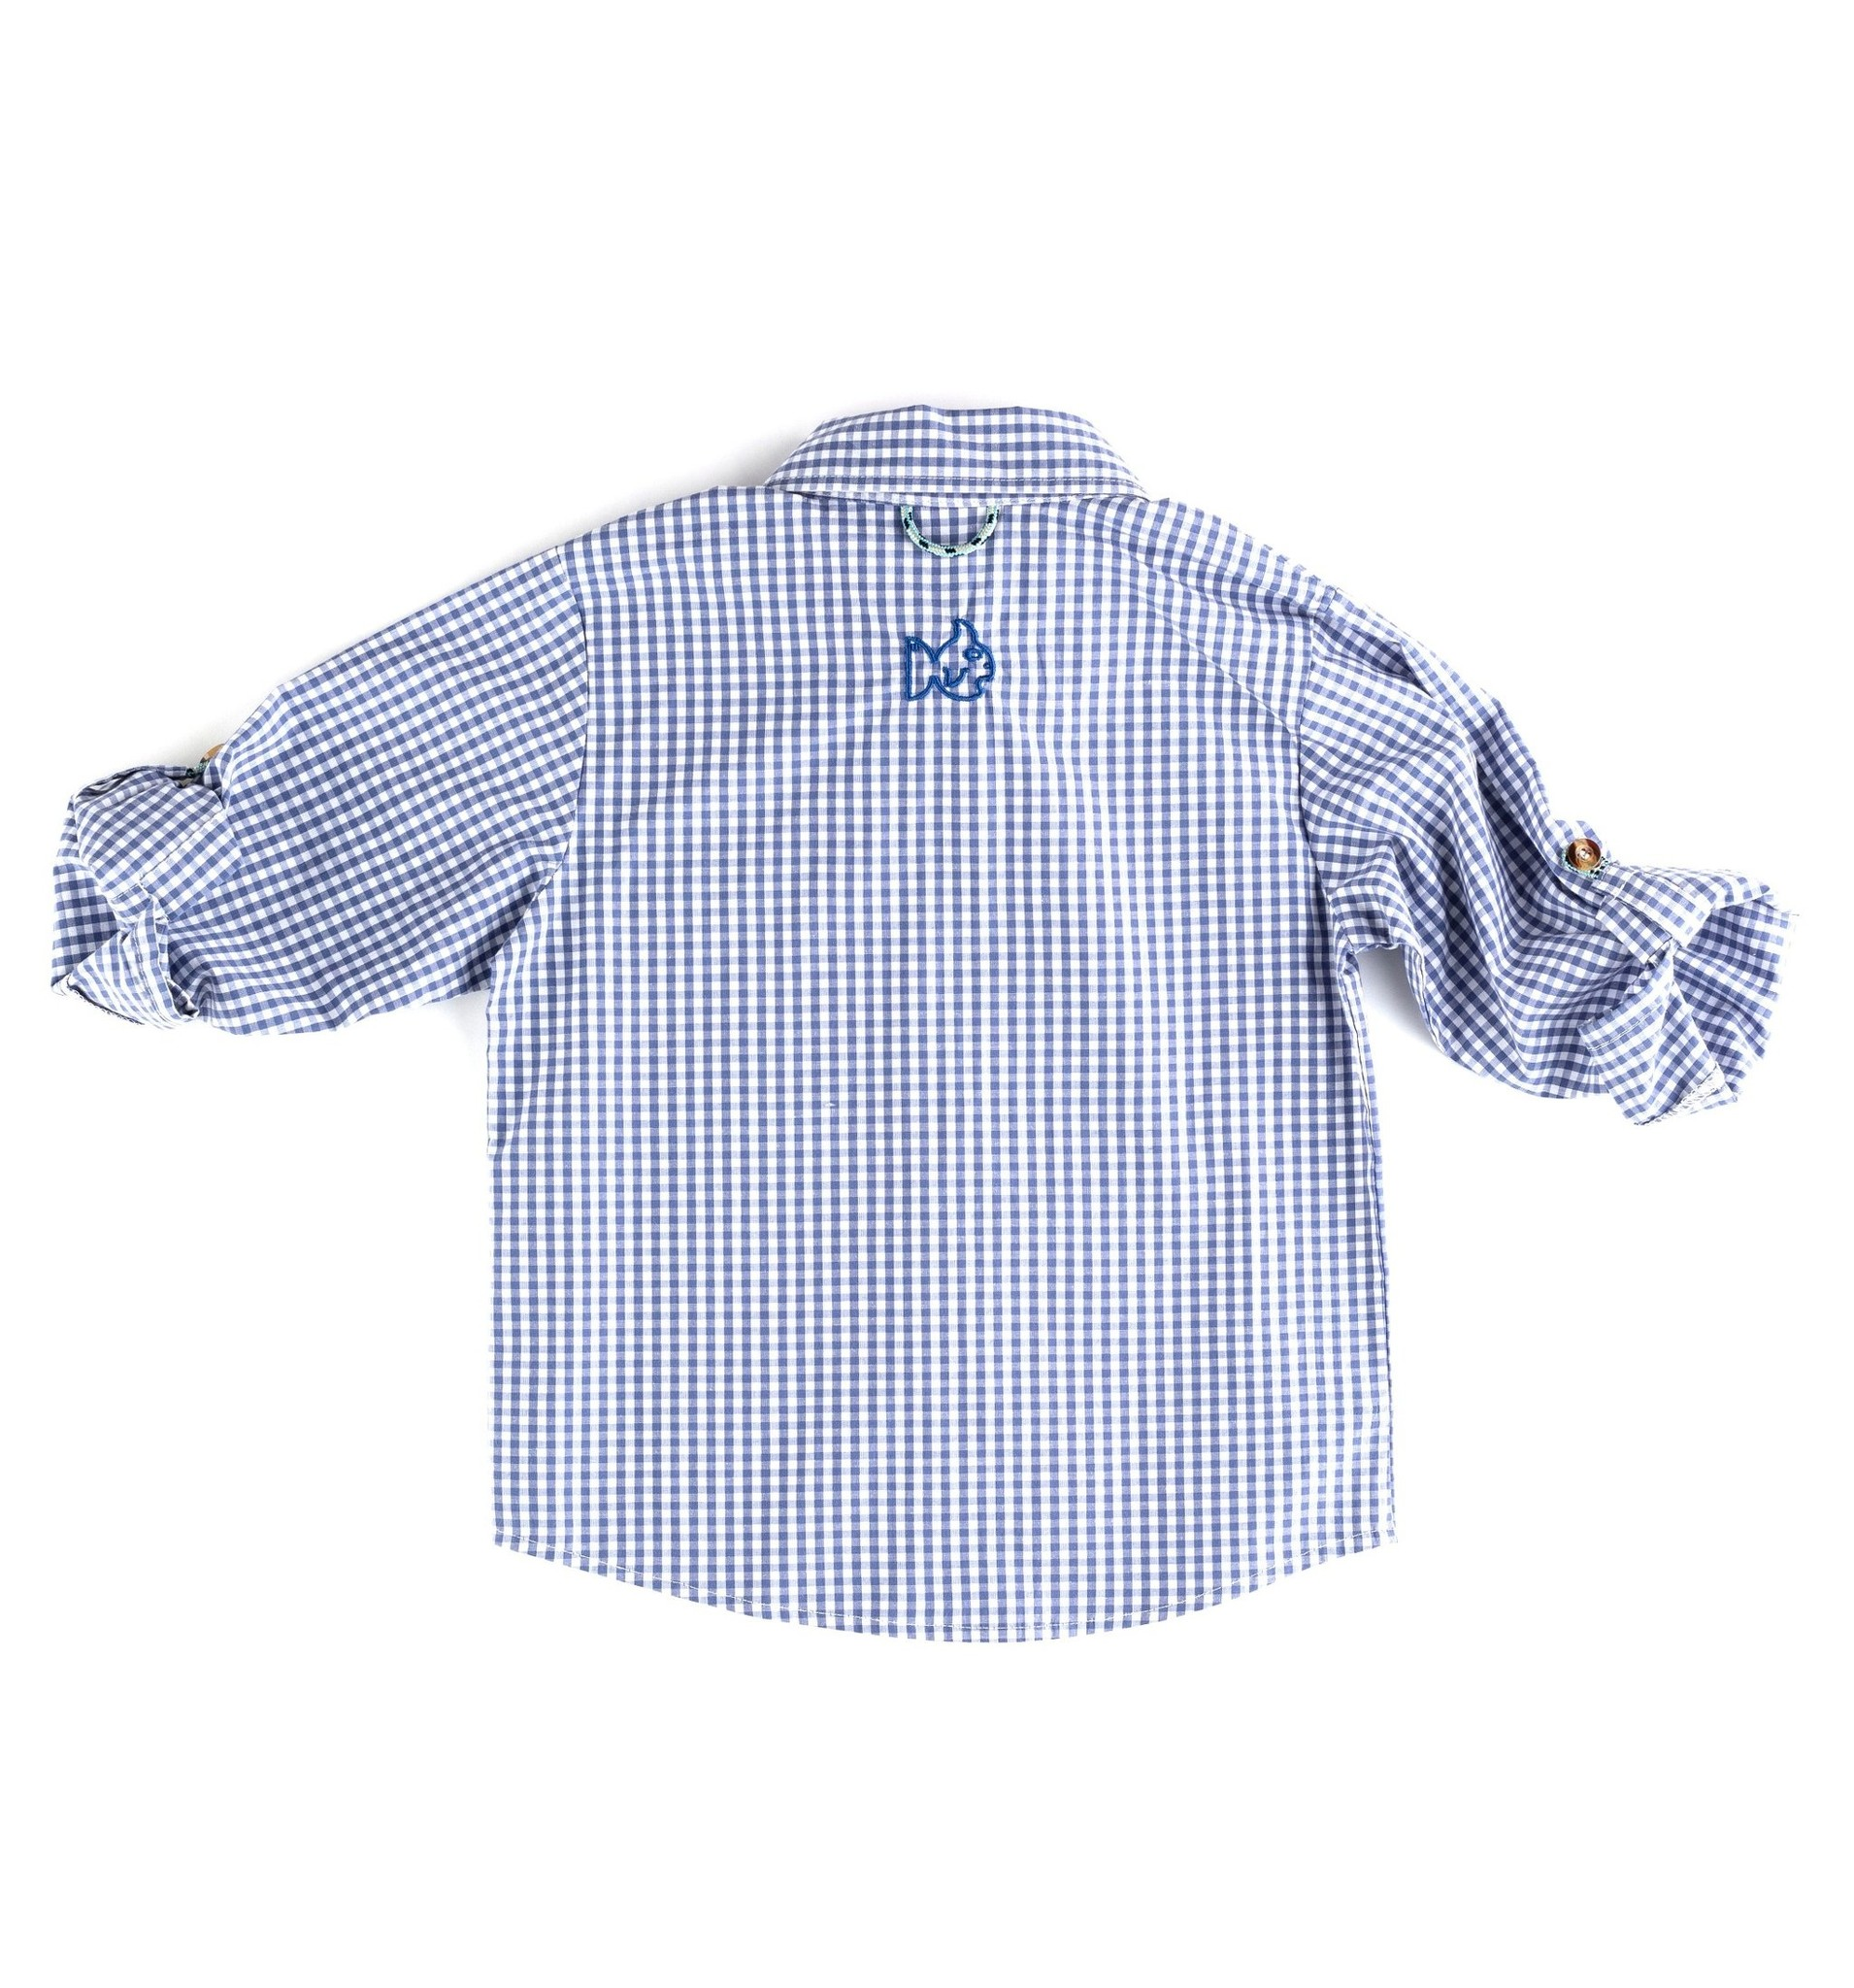 Prodoh Prodoh Gingham Shirt